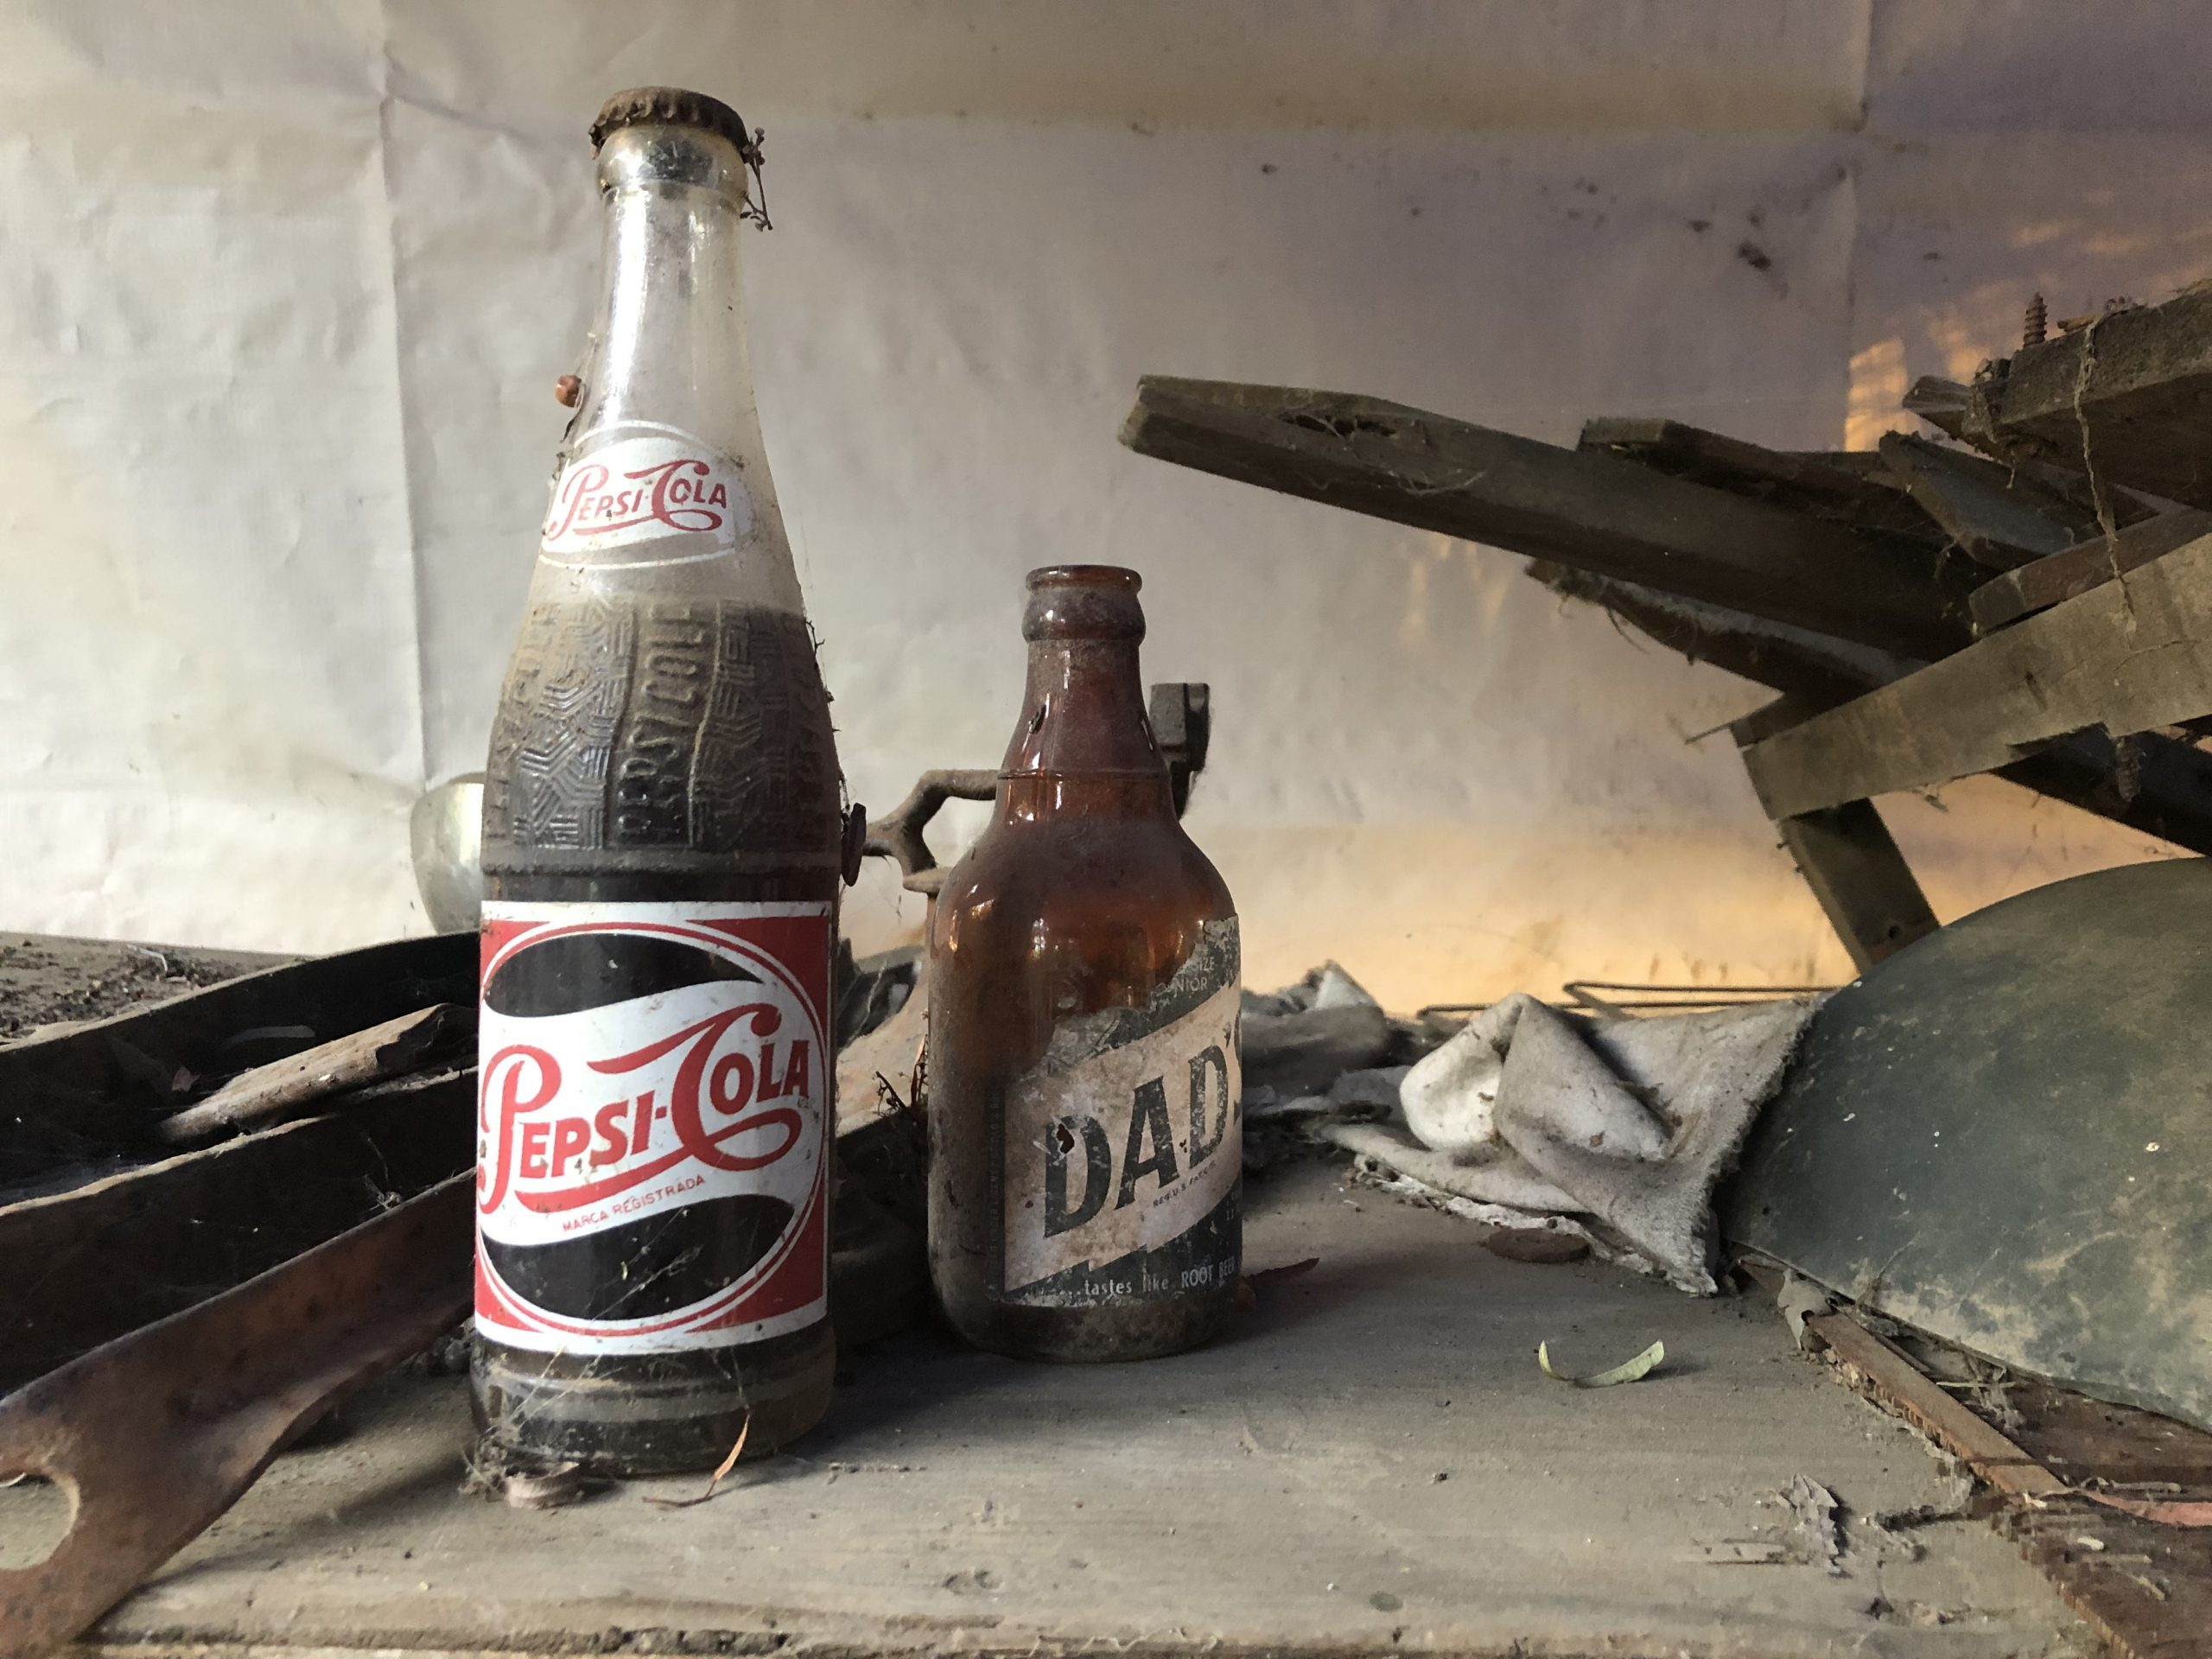 vintage pepsi cola and dads bottles